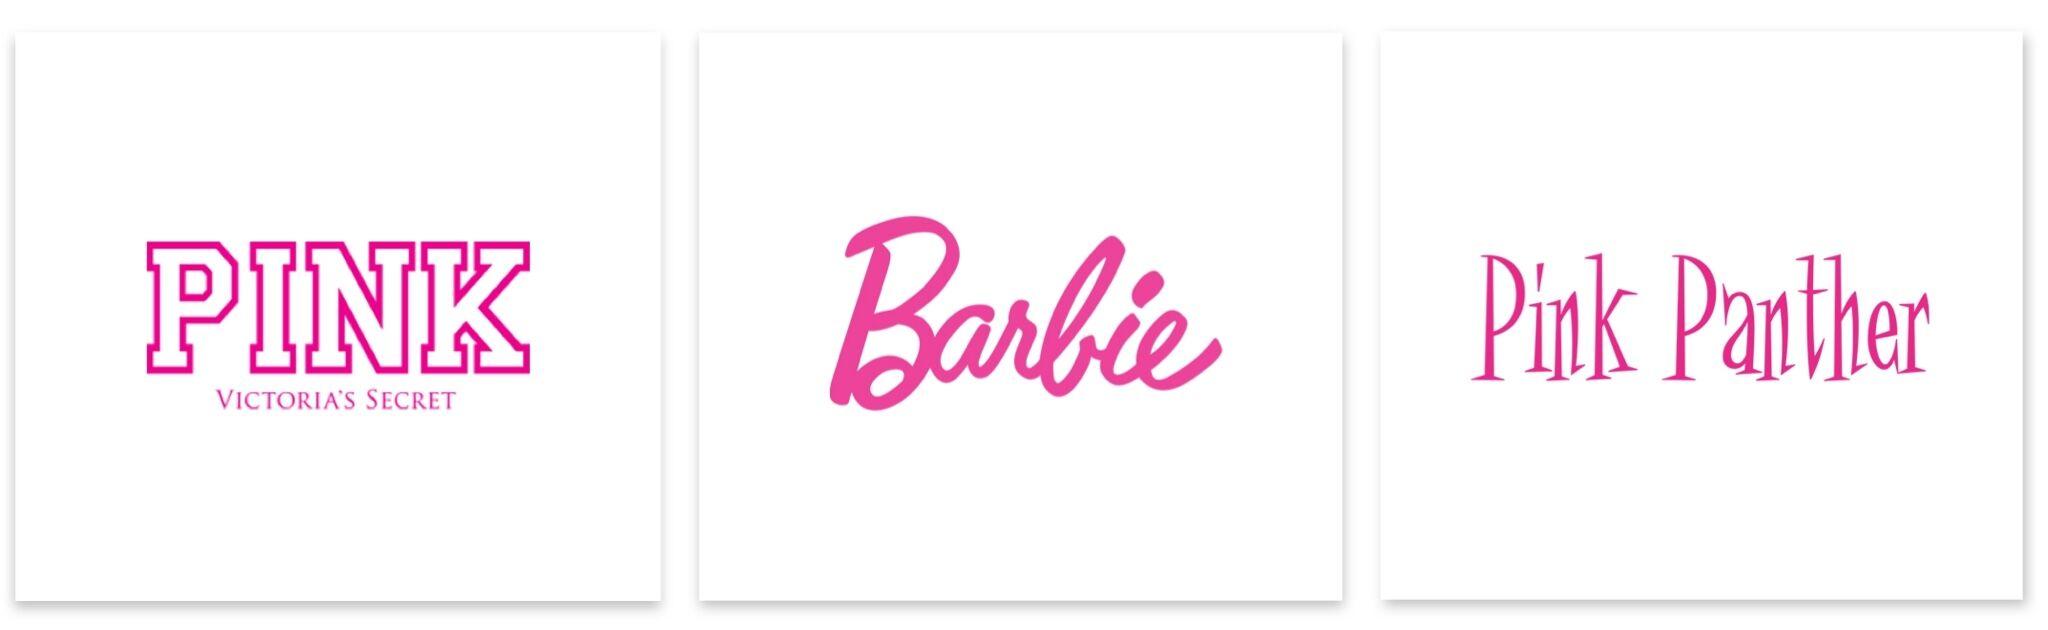 pink logos - victoria's secret-barbie-pink panther